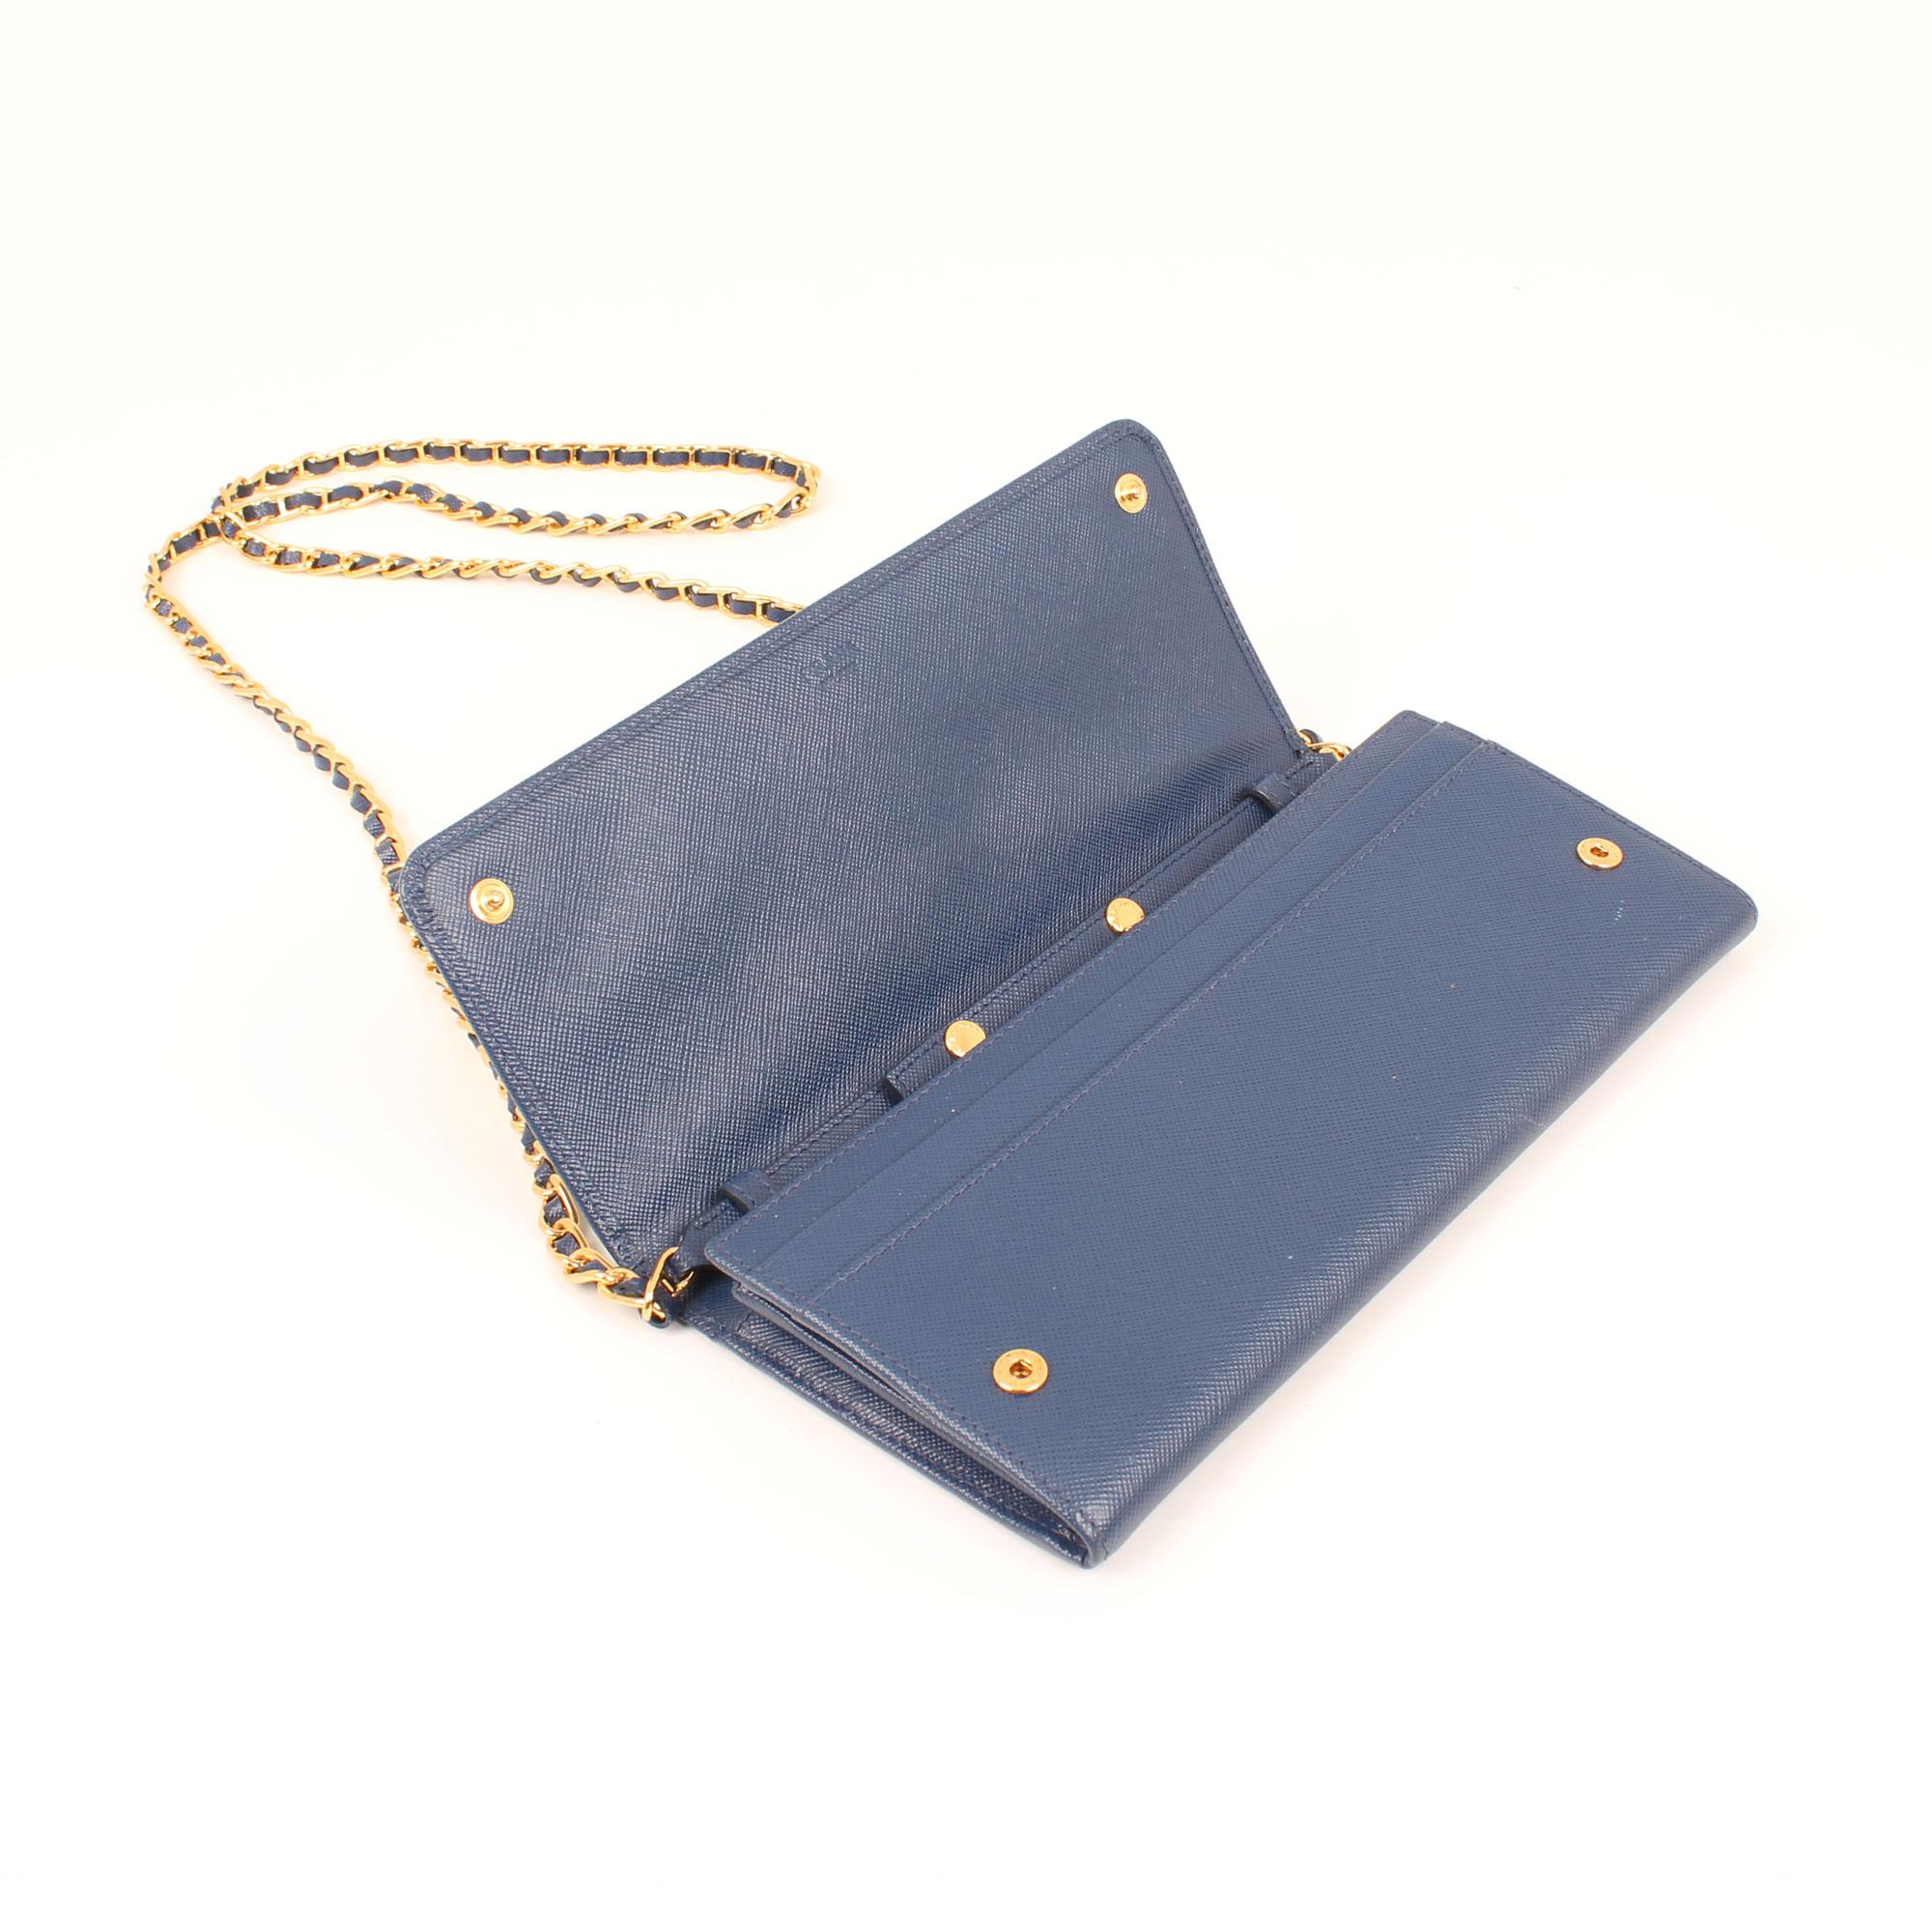 bag-prada-wallet-on-chain-saffiano-metal-bluette-azul-open